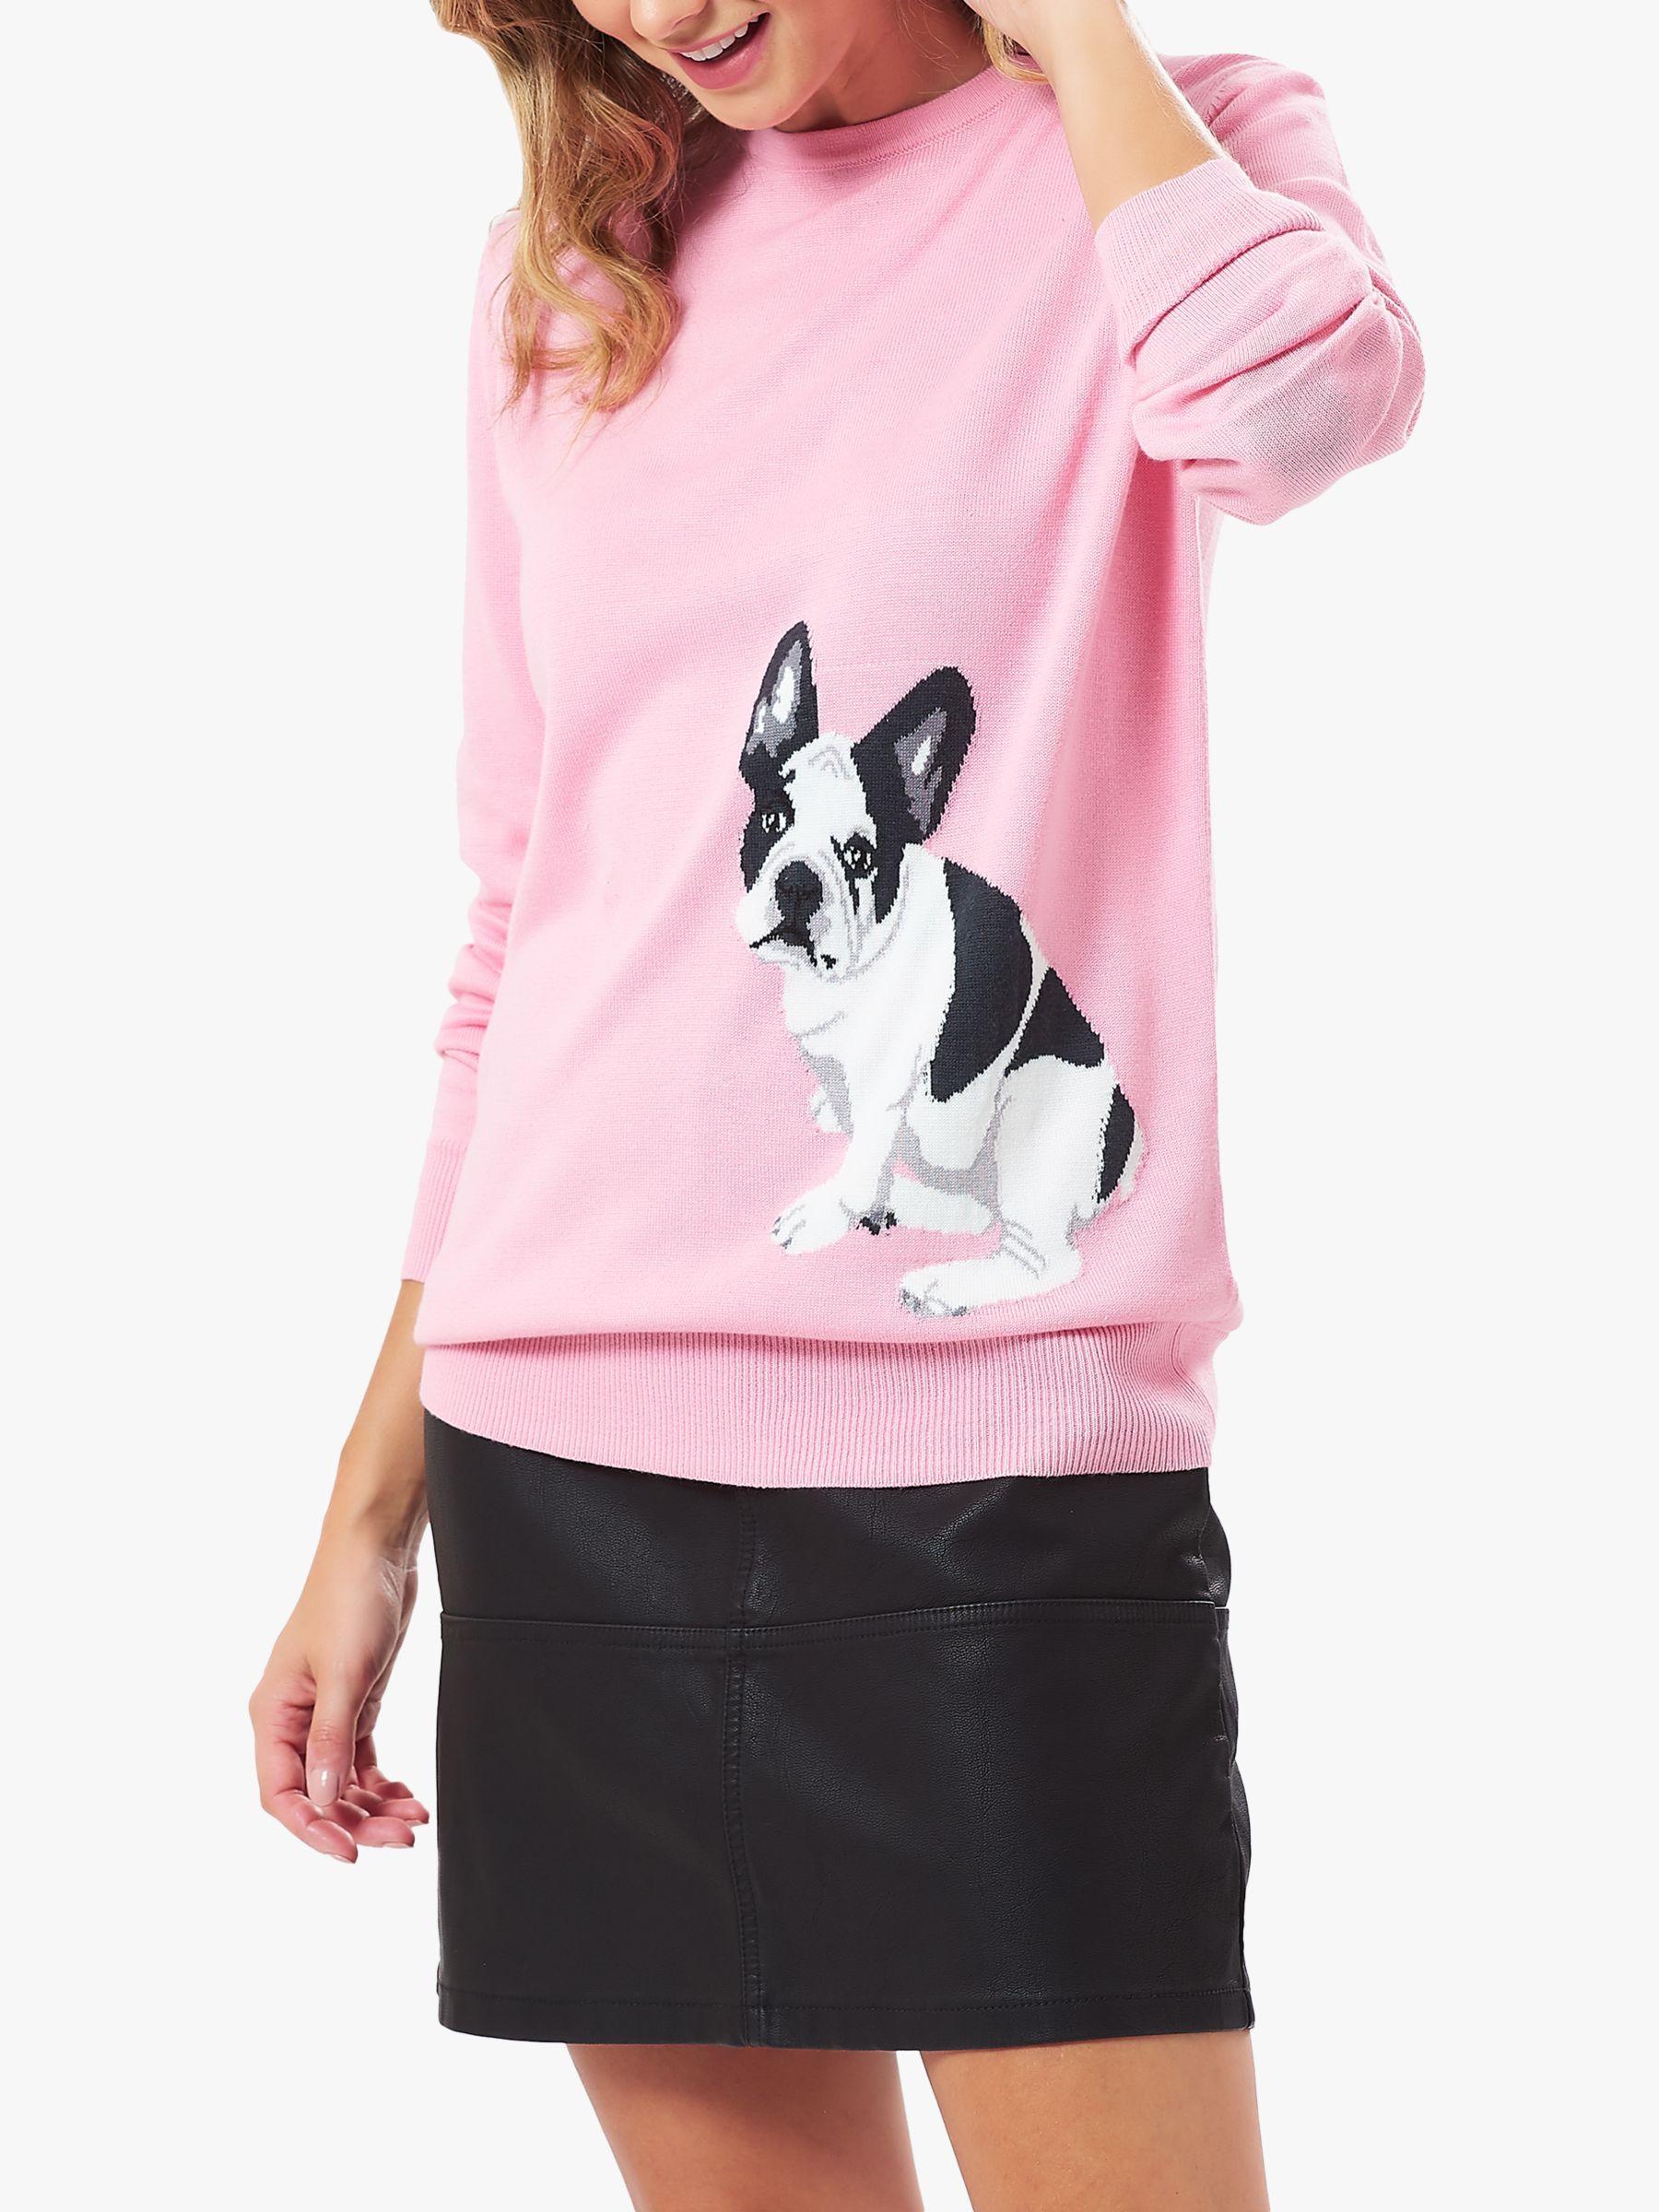 French Bulldog Christmas Jumper.Sugarhill Brighton Rita French Bulldog Knitted Jumper Pink